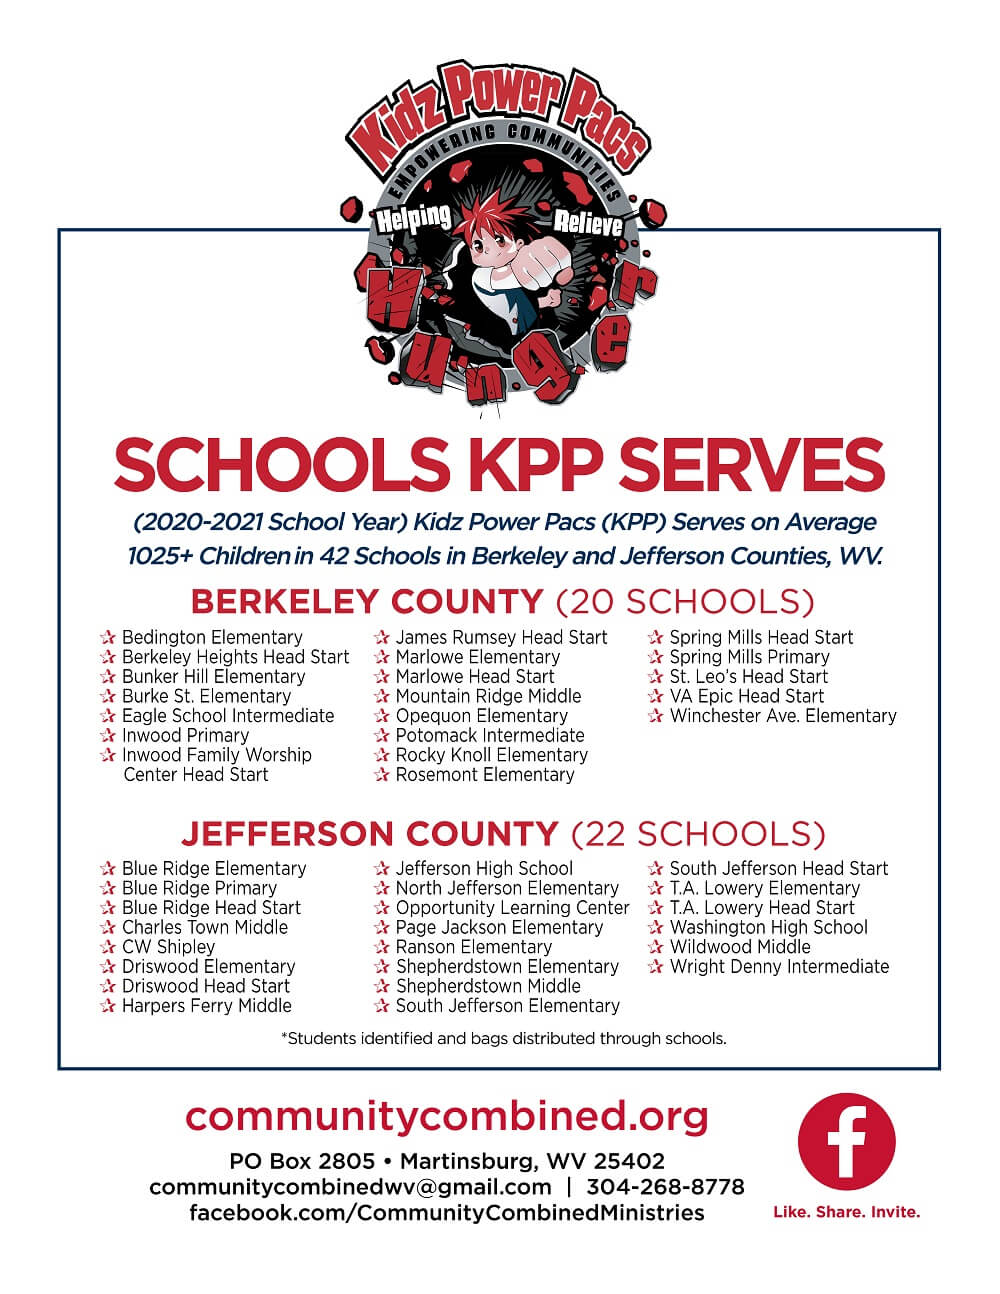 KPP serves 20 schools in berkeley county and 22 jefferson